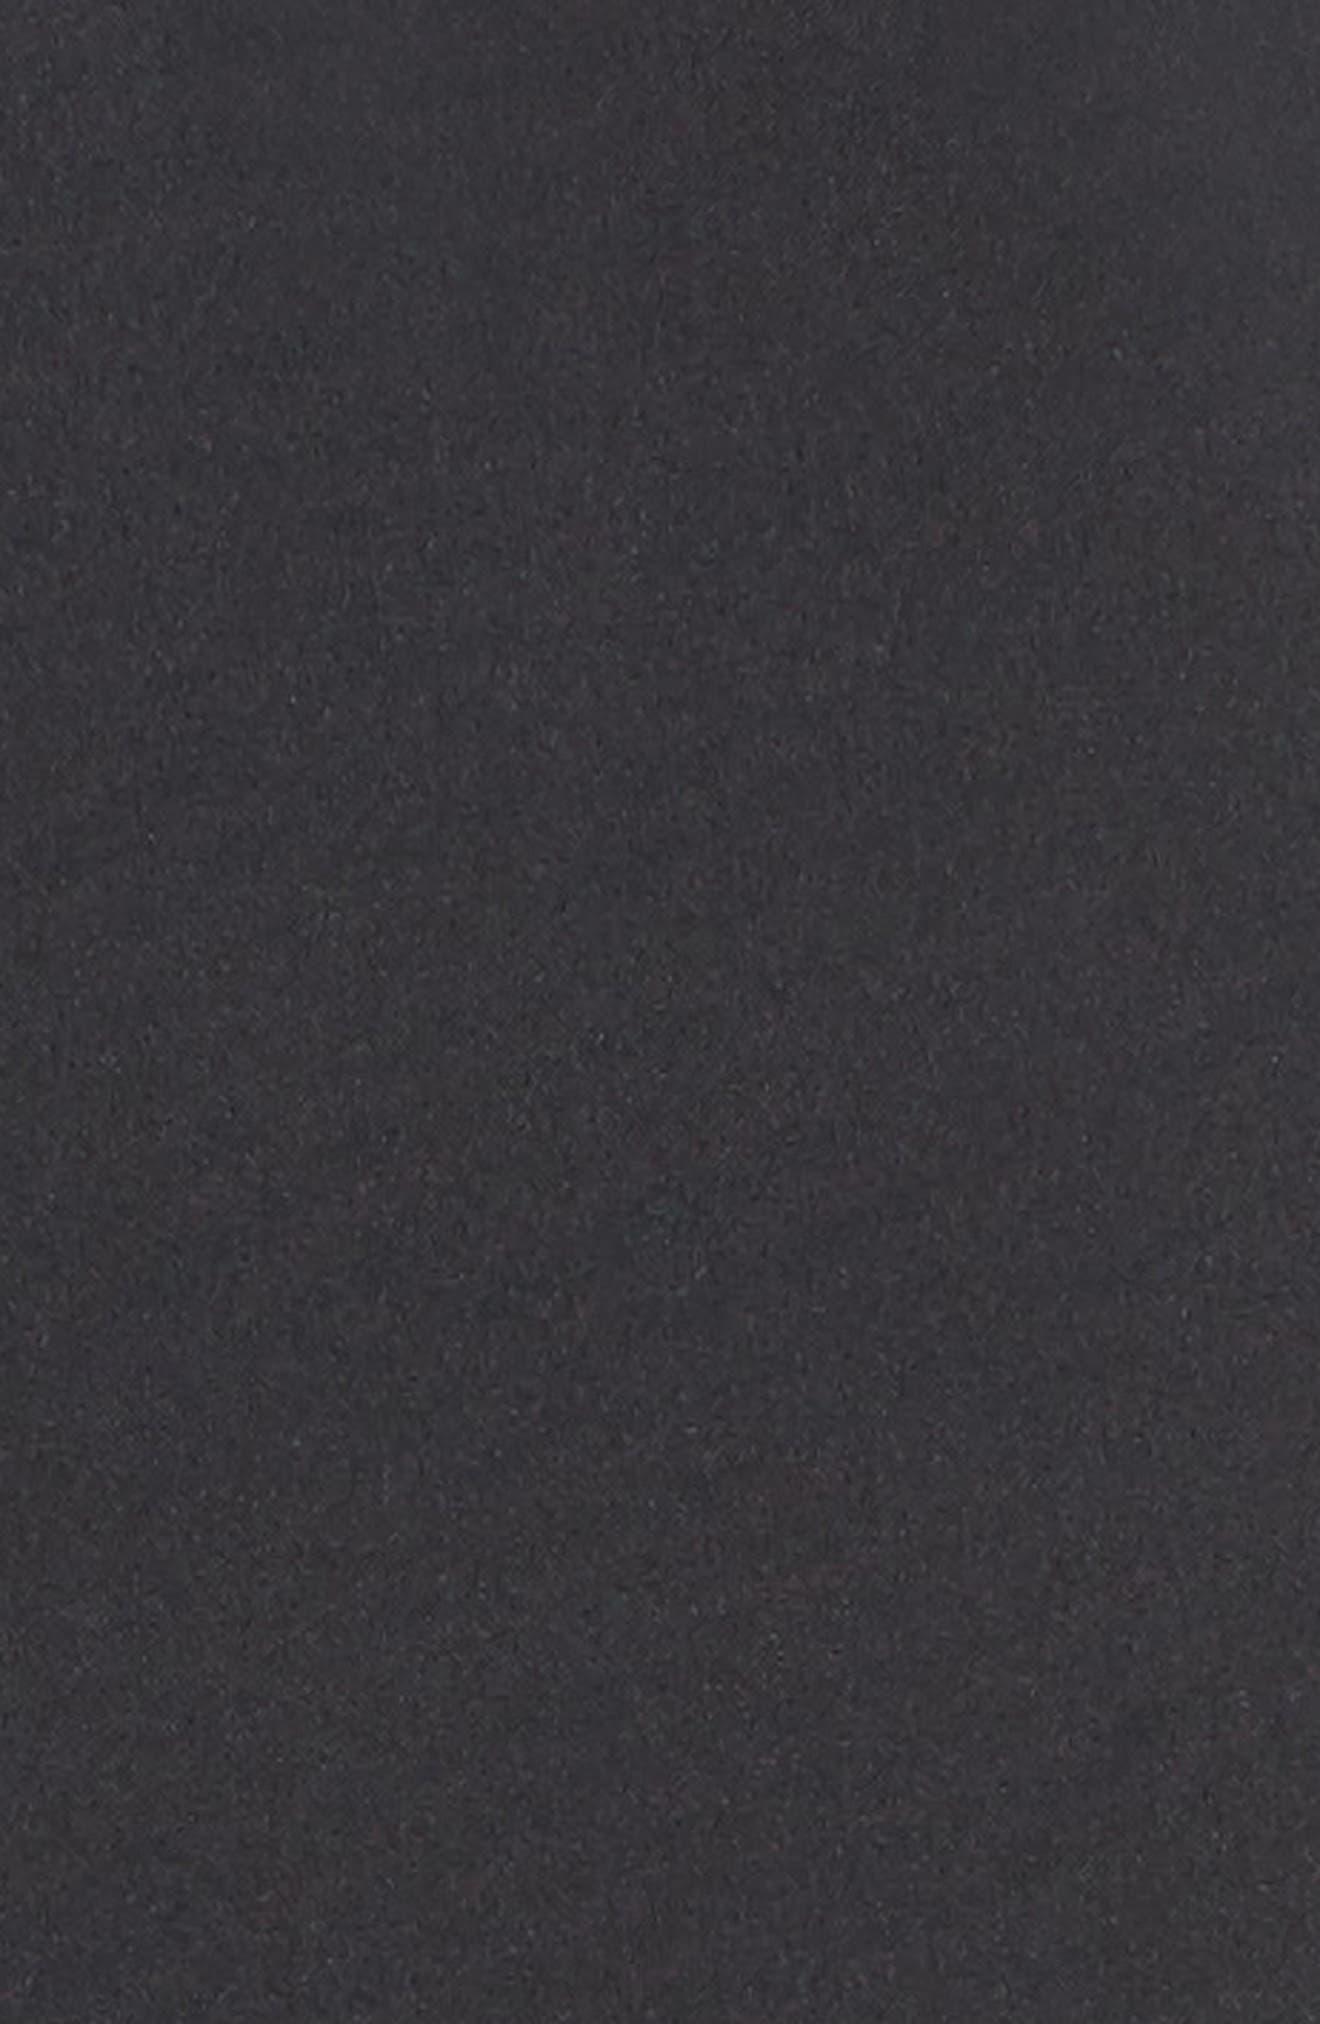 Essential Flex Running Pants,                             Alternate thumbnail 5, color,                             Black